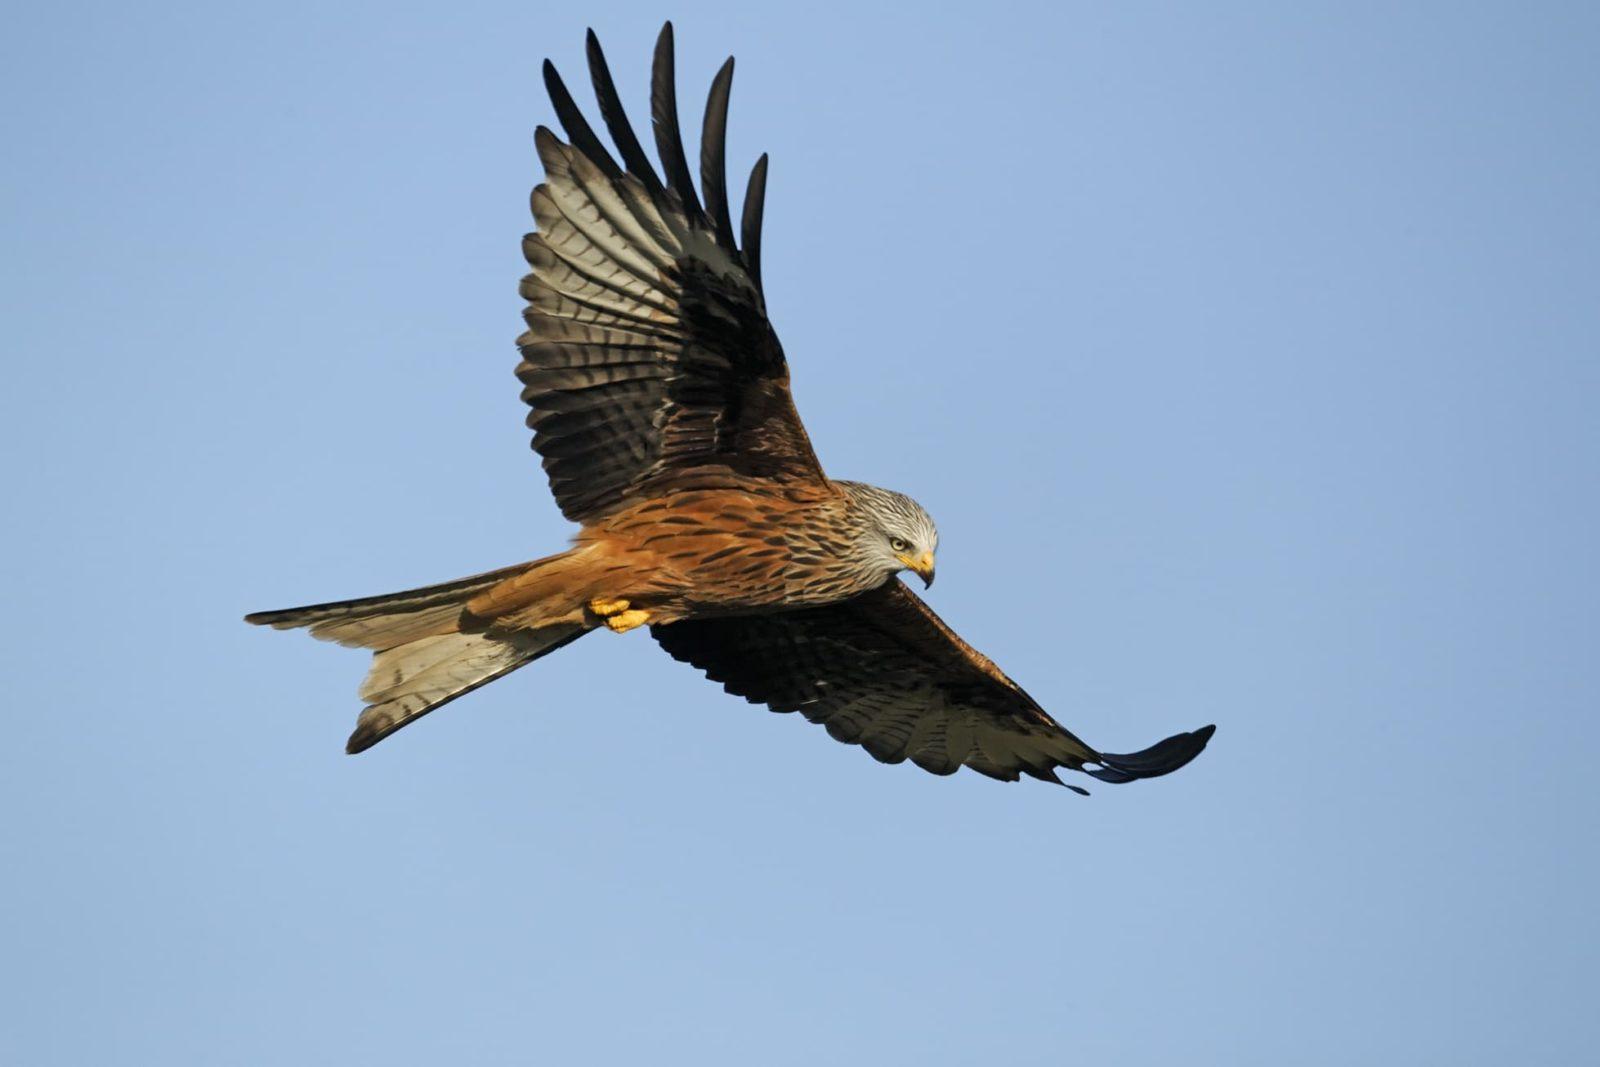 Red kite bird in flight